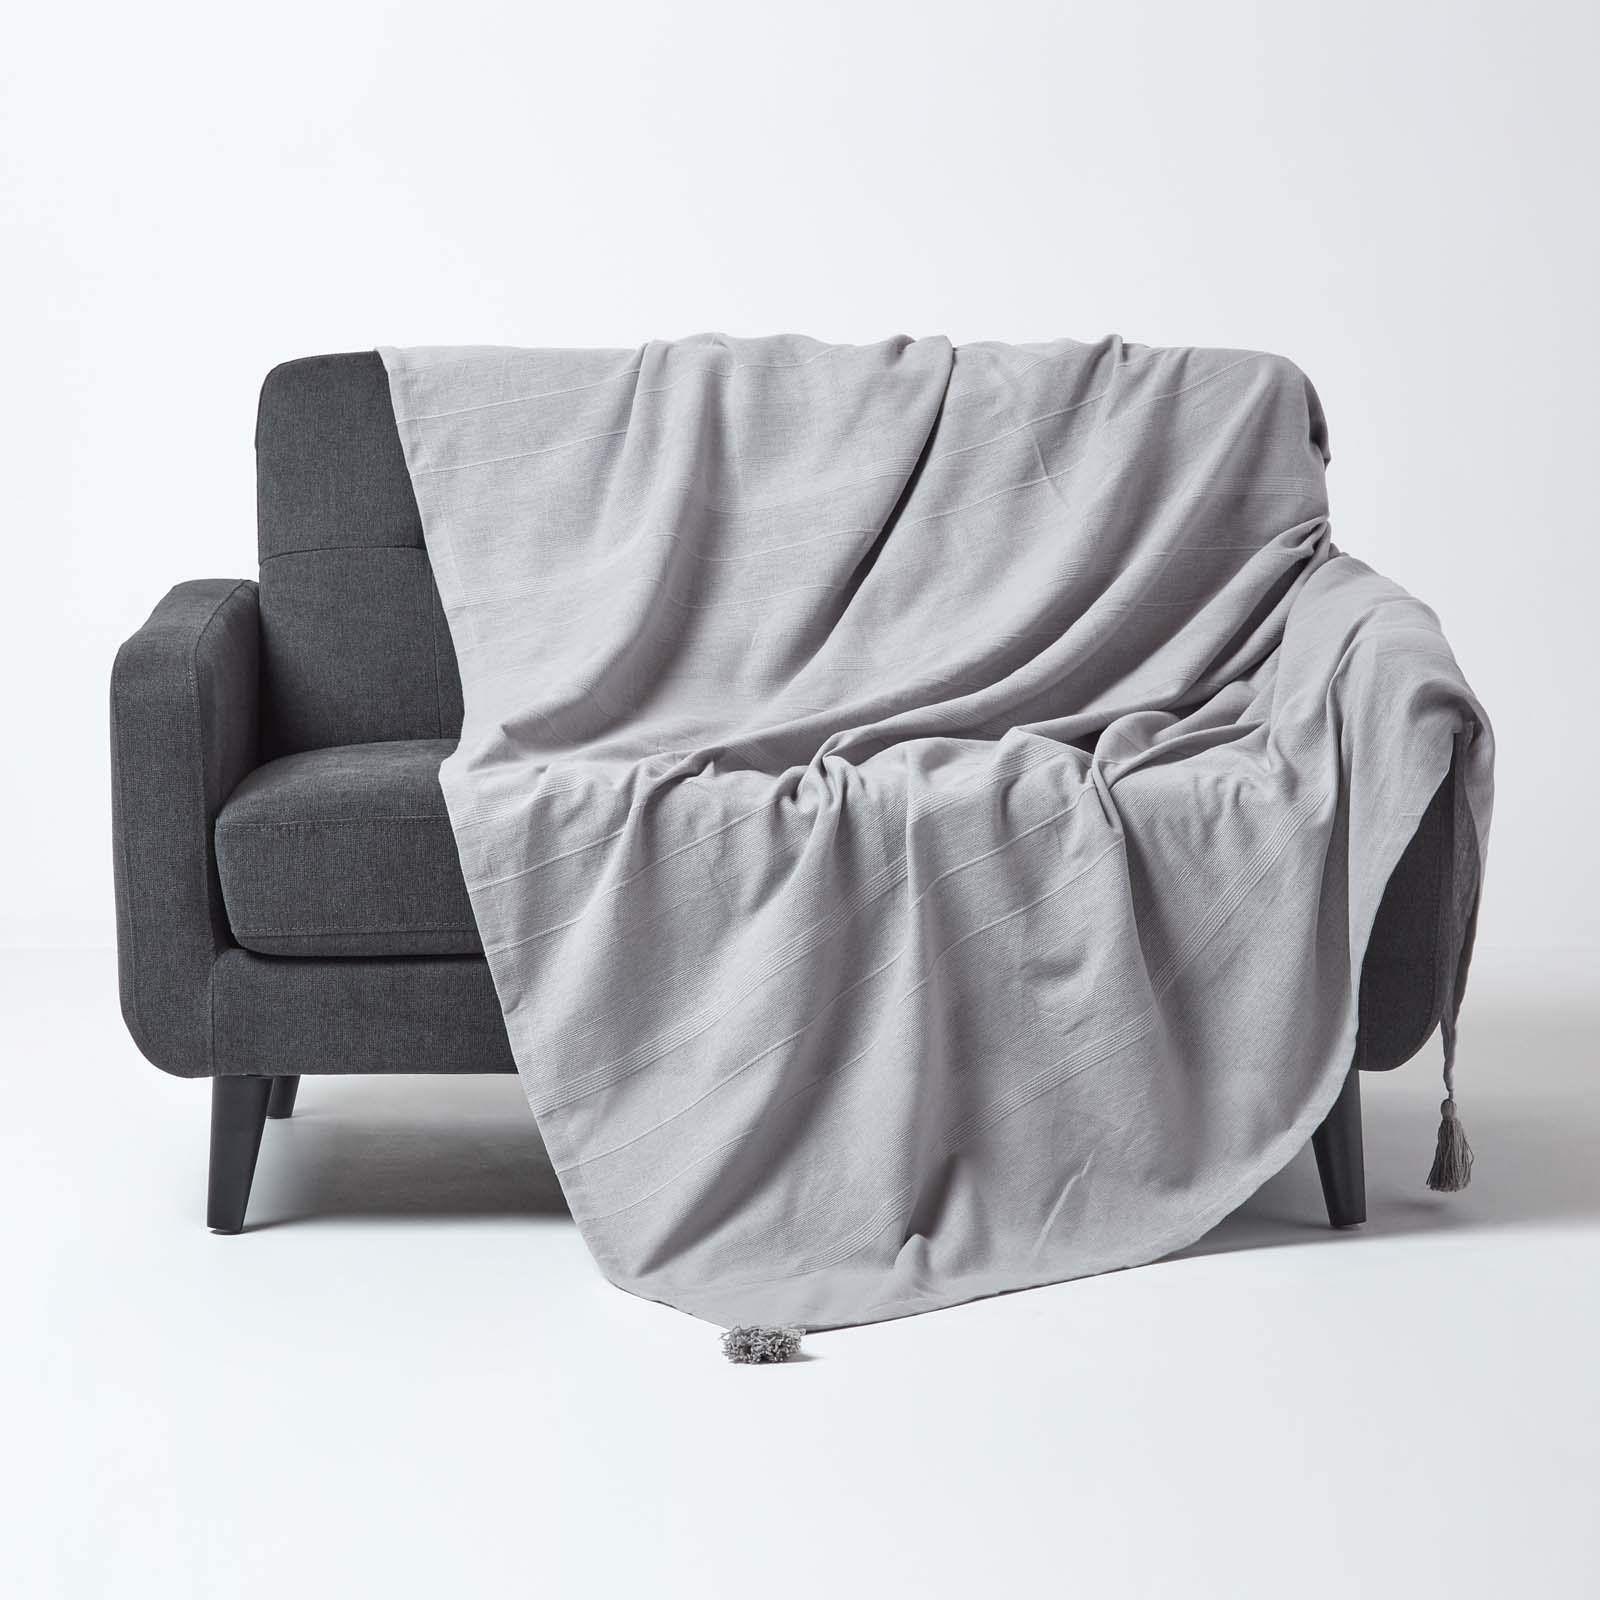 Homescapes Tagesdecke Rajput Aus 100 Baumwolle Hellgrau 150 X 200 Cm Sofa Berwurf Sberwurfdecke Couch Berwurf In In 2020 Tagesdecke Wohnzimmer Grau Couchuberwurf